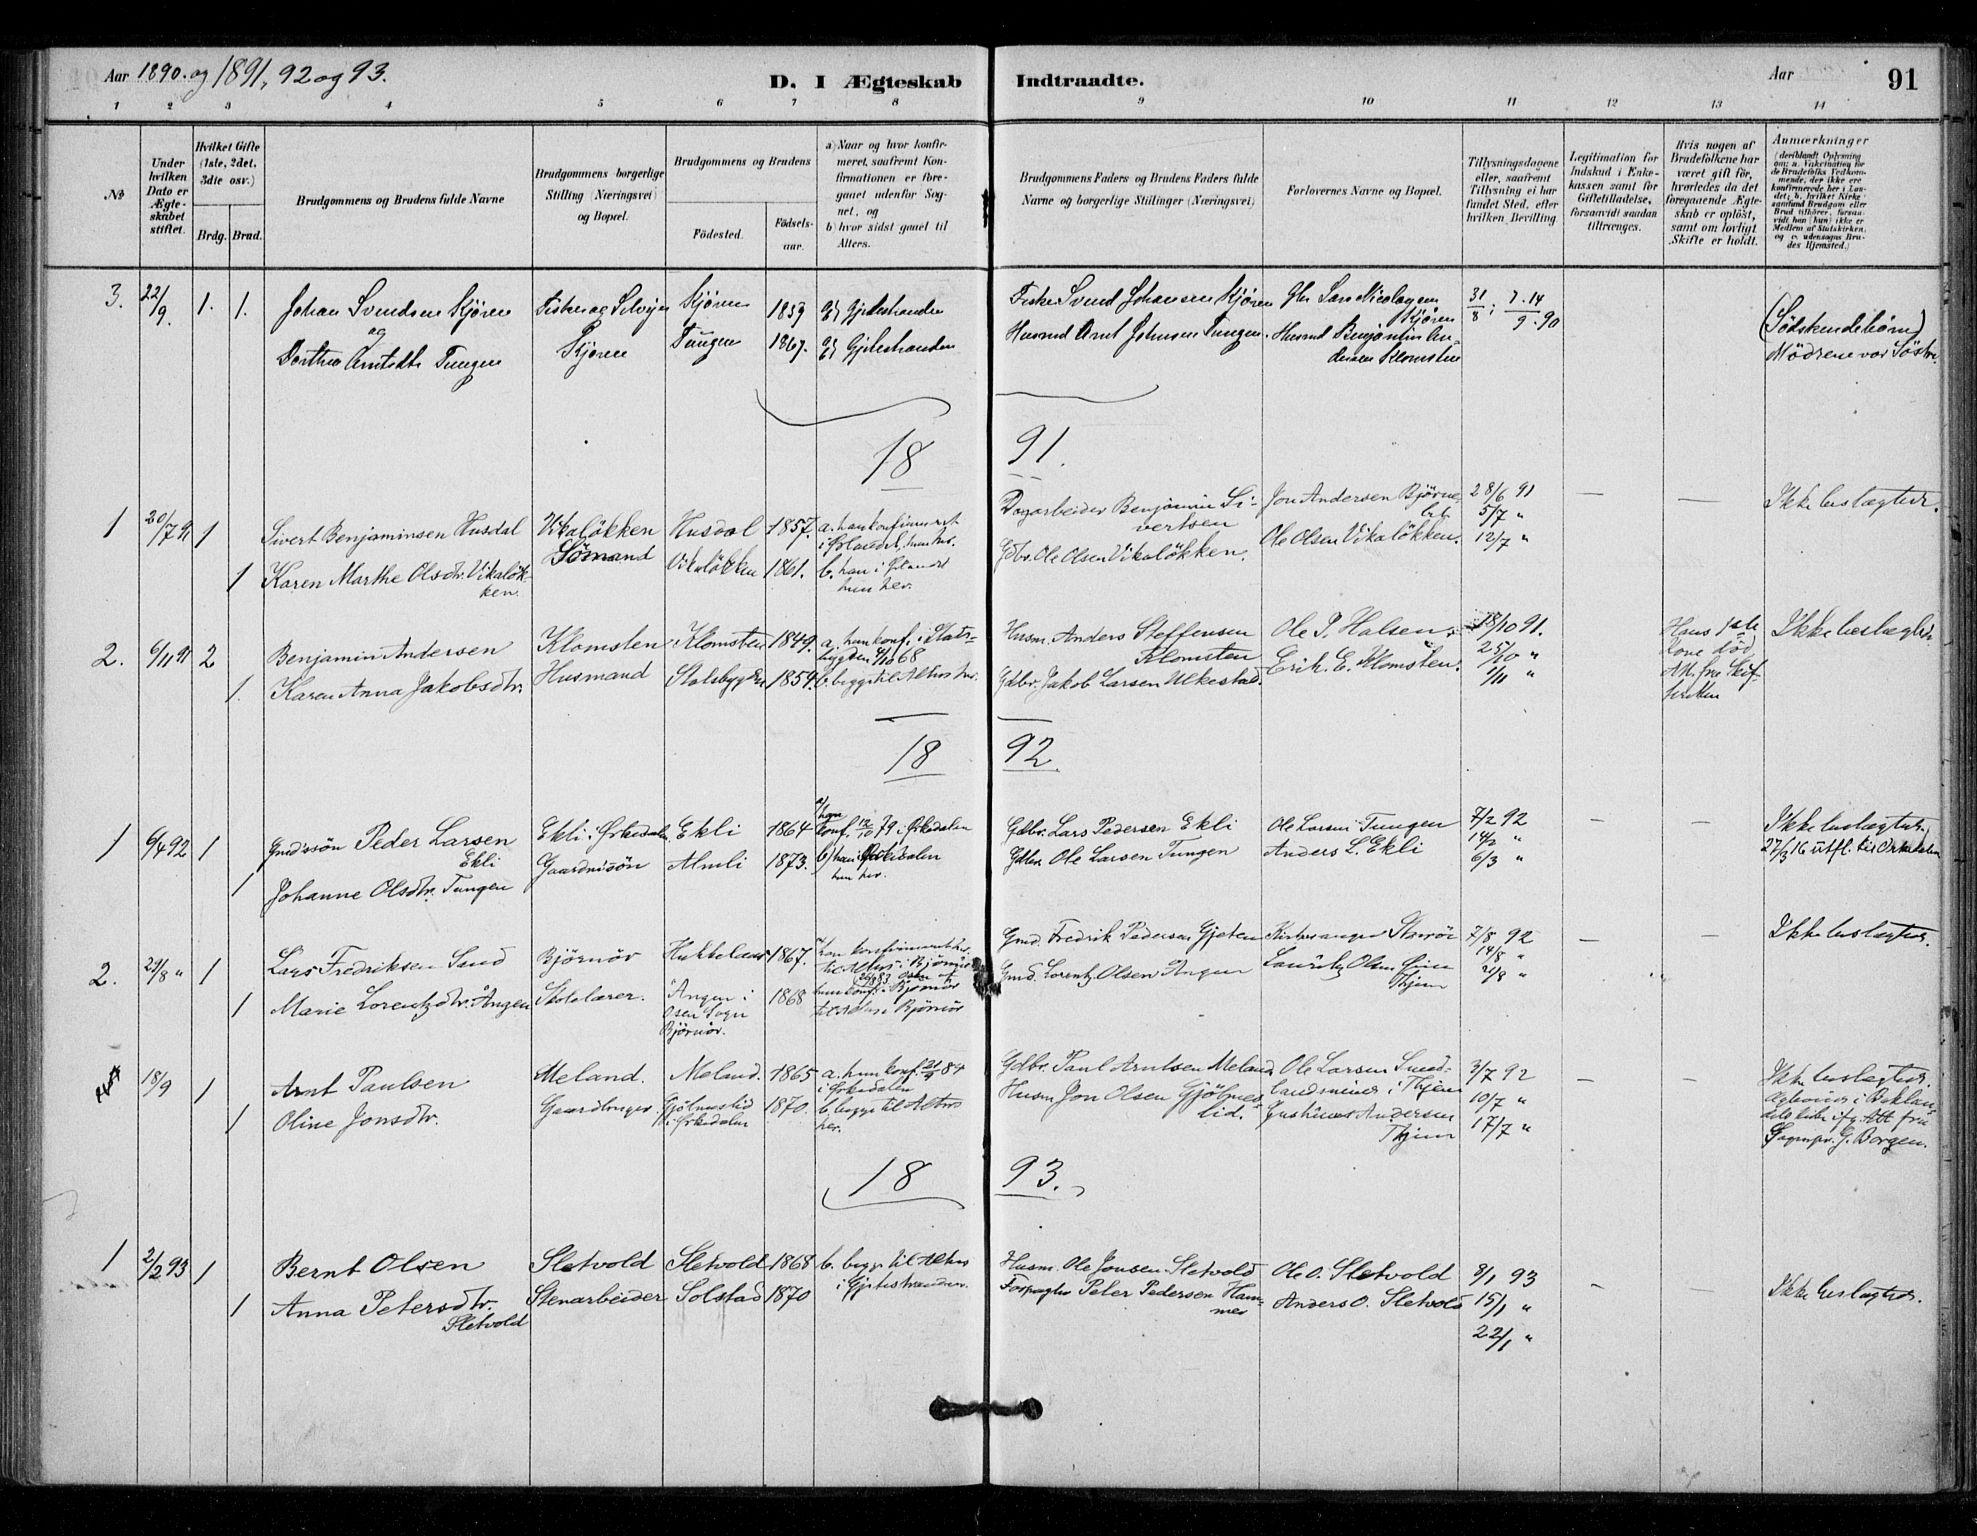 SAT, Ministerialprotokoller, klokkerbøker og fødselsregistre - Sør-Trøndelag, 670/L0836: Parish register (official) no. 670A01, 1879-1904, p. 91